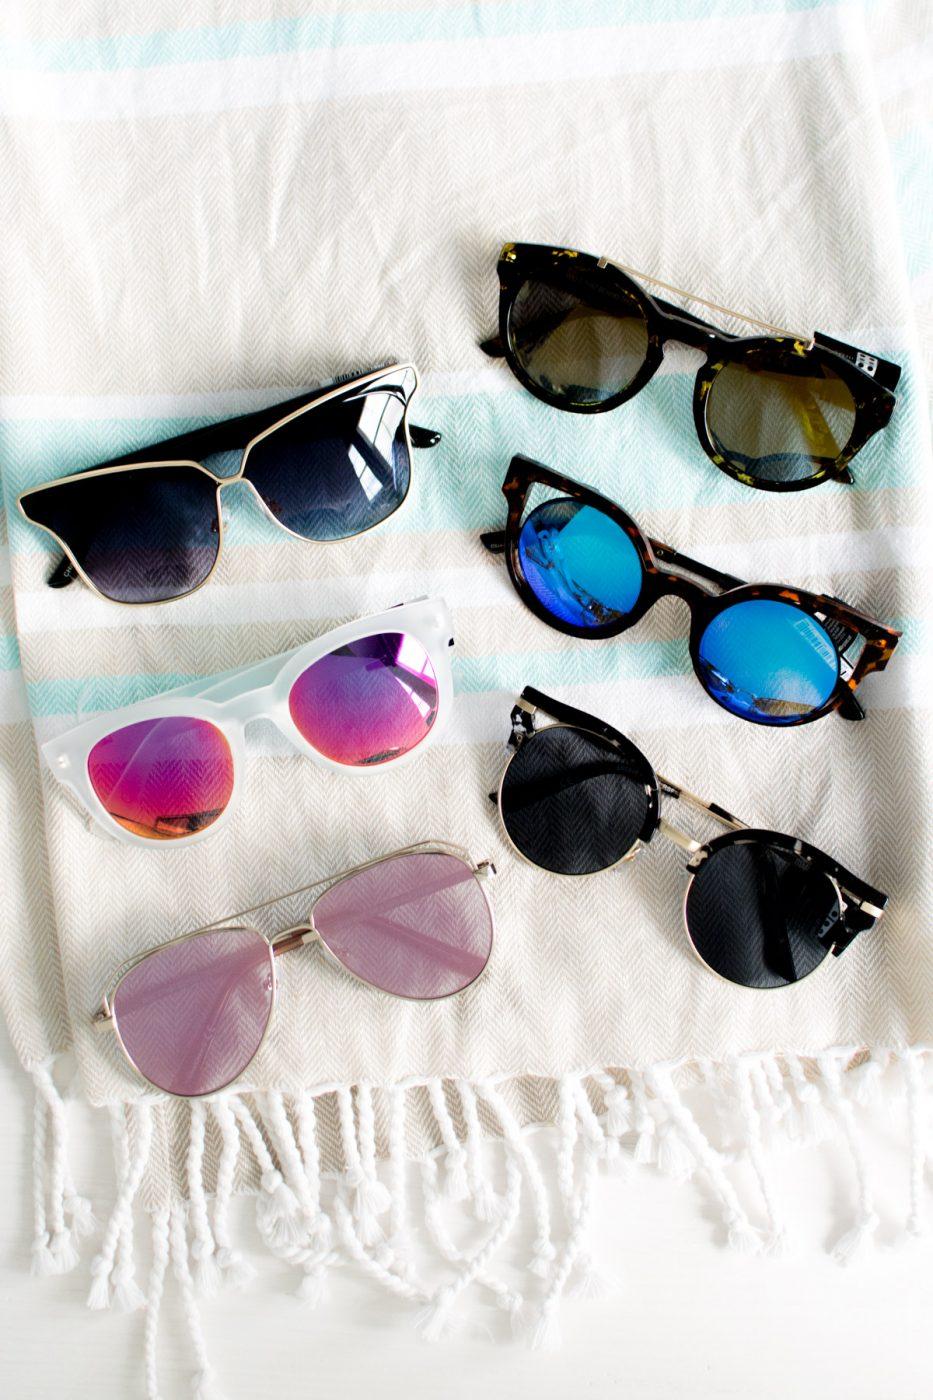 Item 8 Sunglasses - Beach Bag Essentials